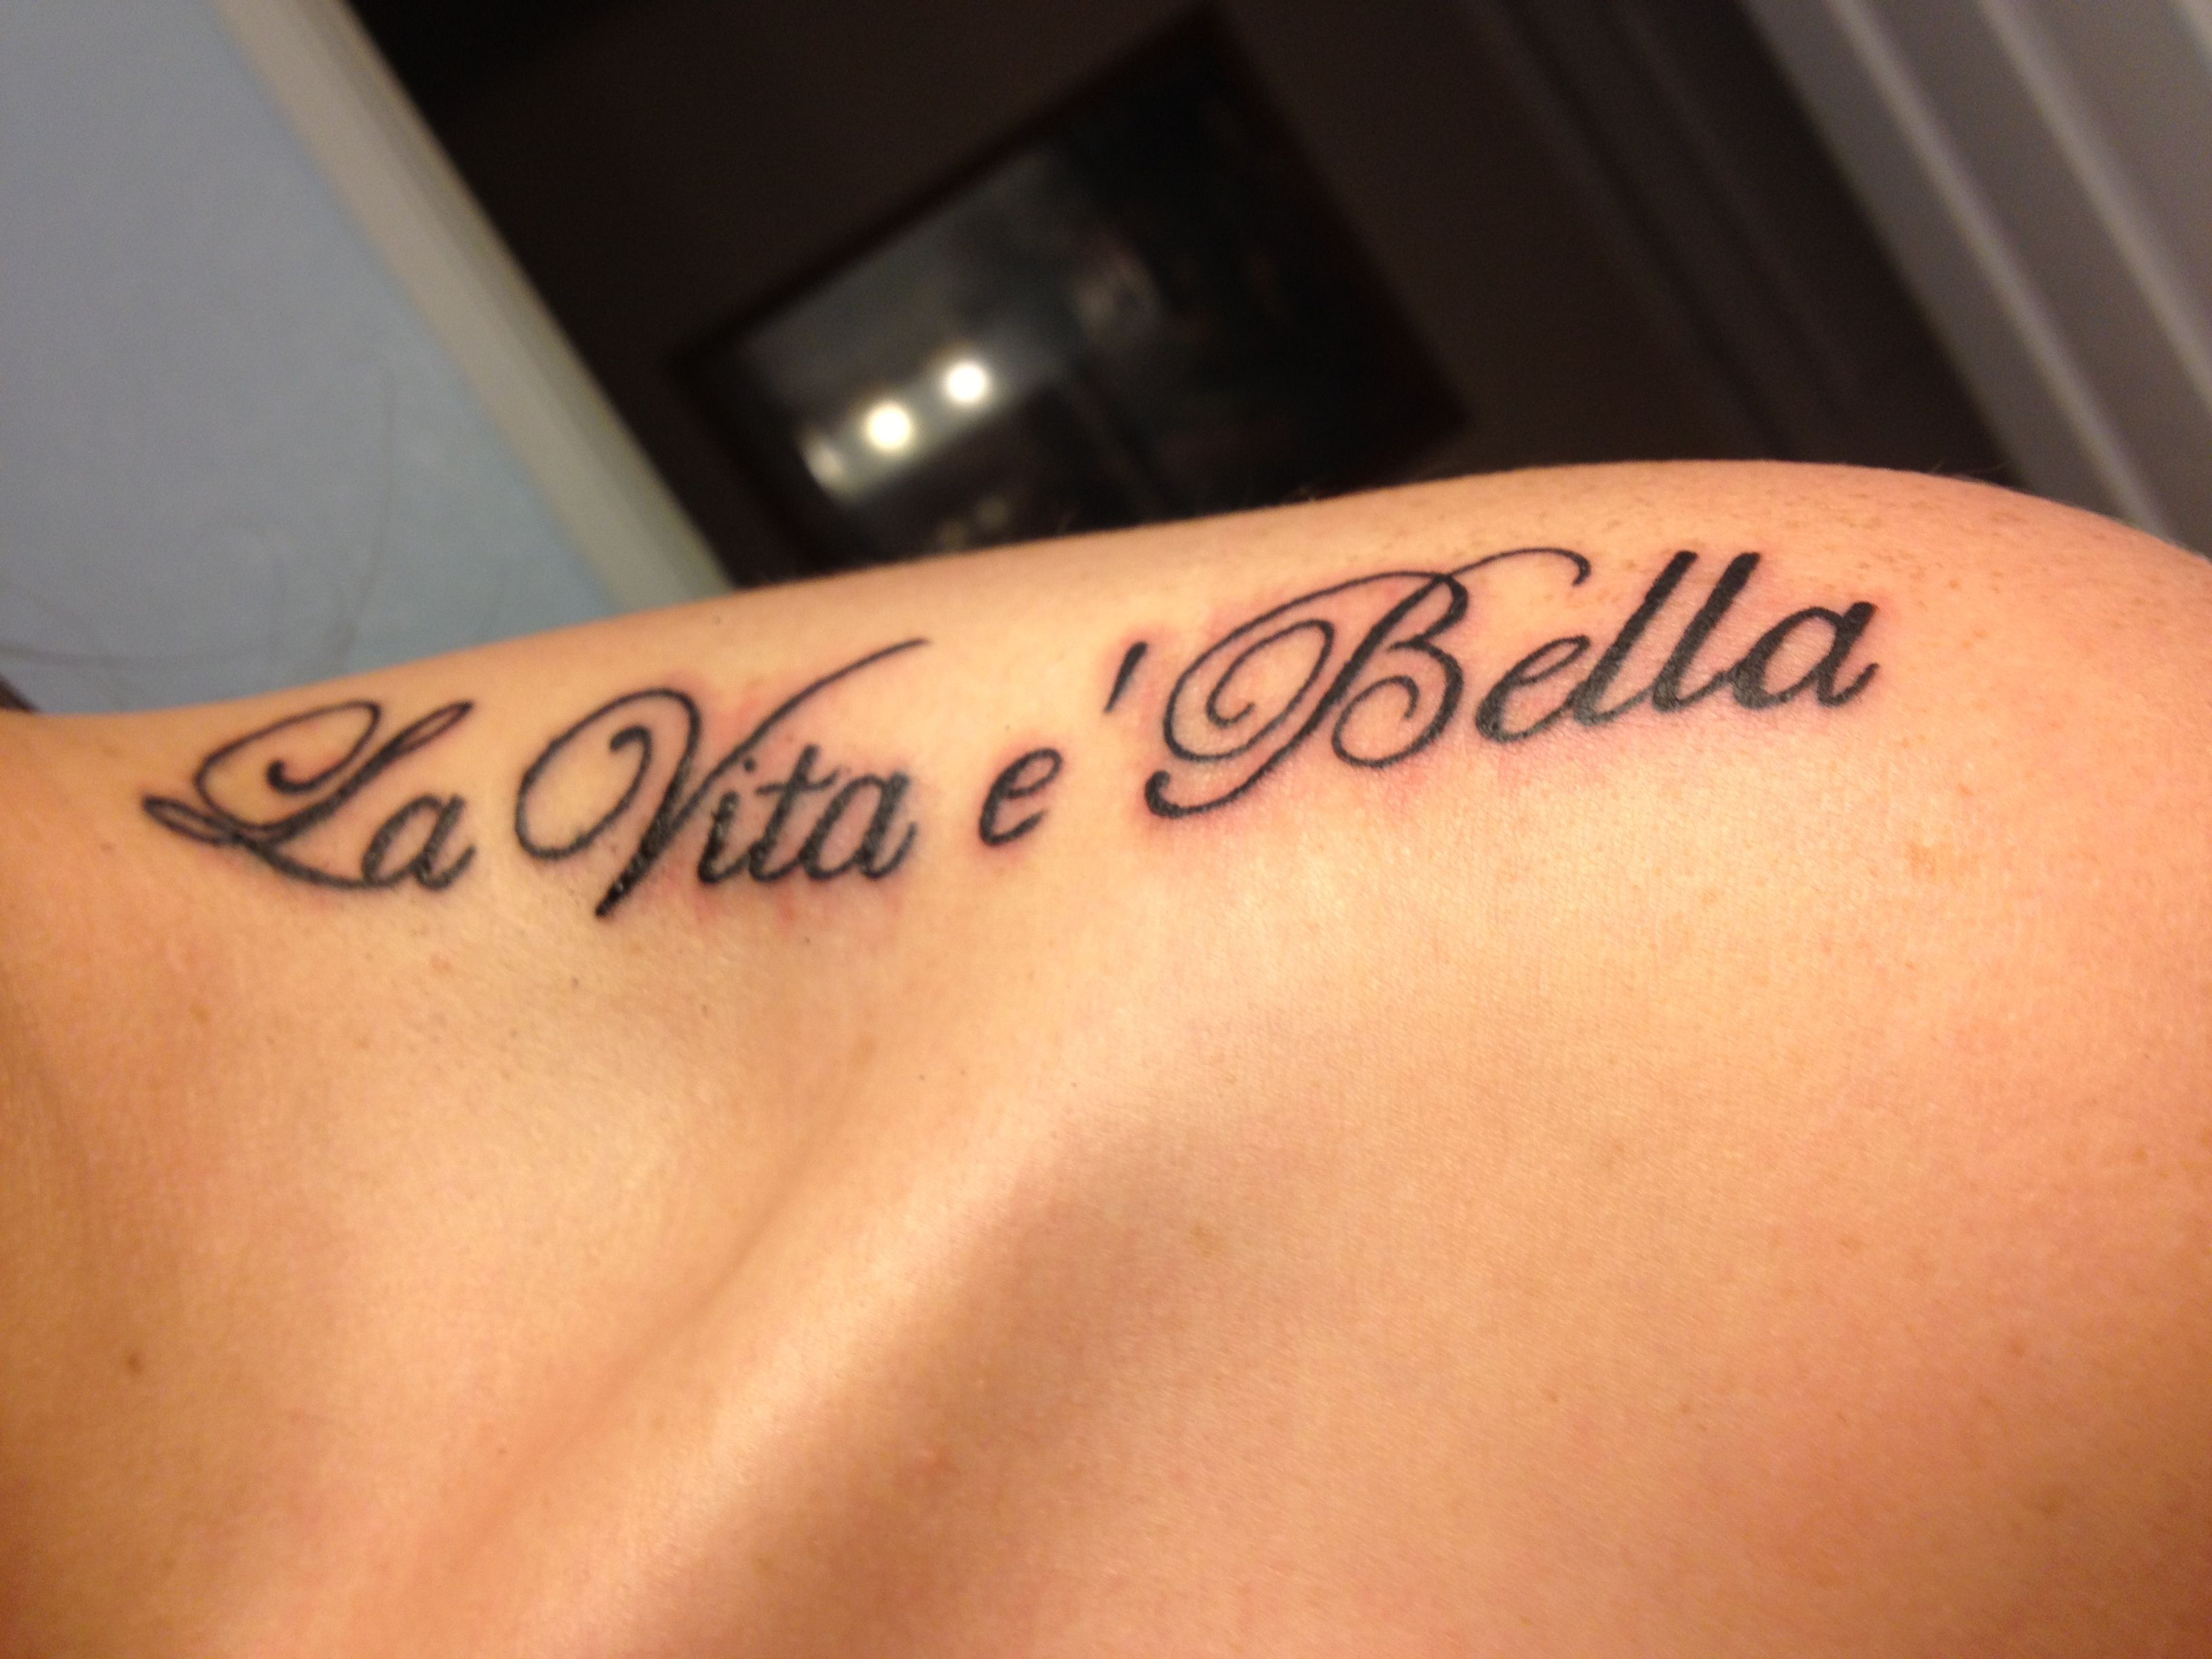 Italian tattoo words and phrases mixworld - Future Tattoos